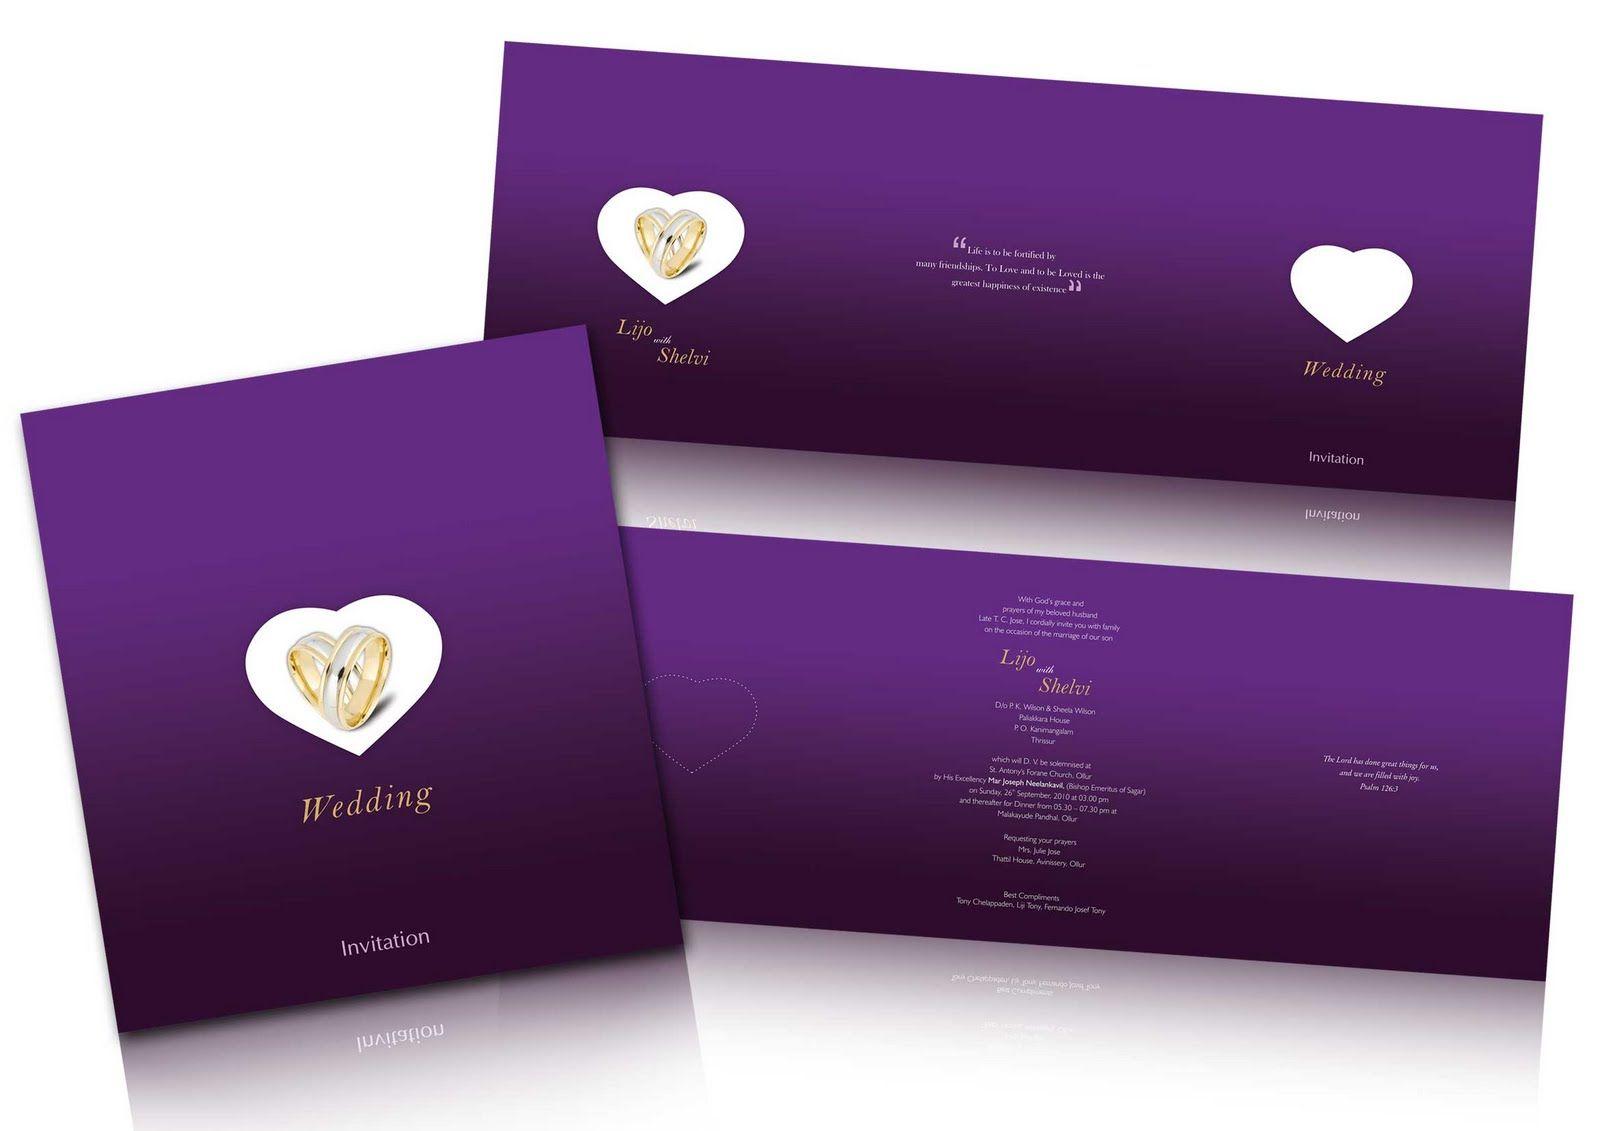 Pin By Saifee Wedding Cards On Hearts Style Wedding Invitations Wedding Planner Guide Wedding Cards Wedding Invitations